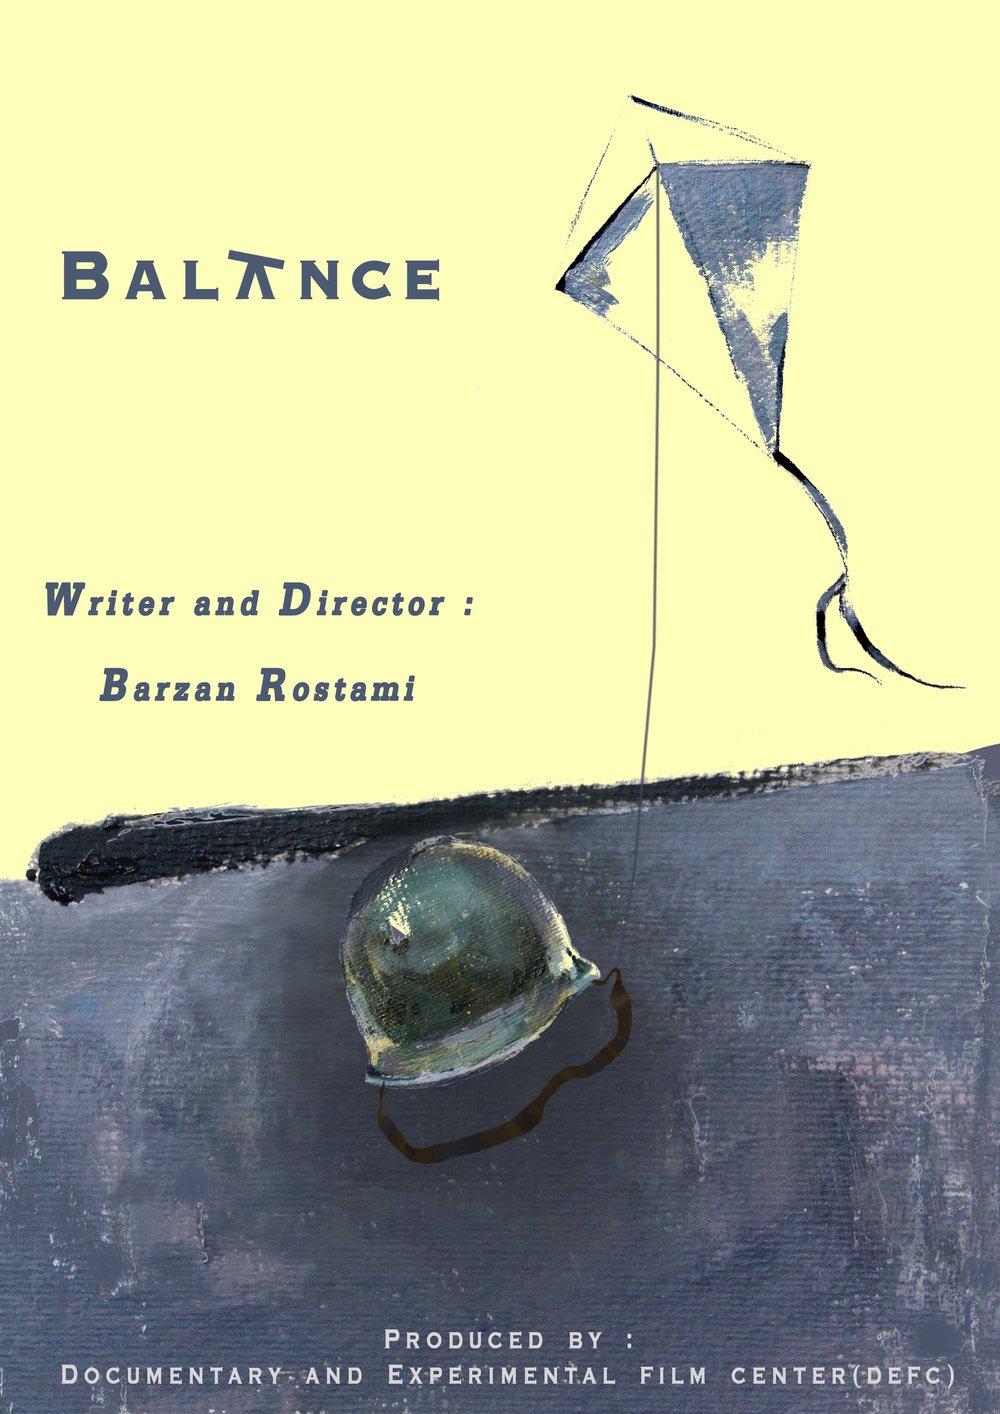 BALANCE poster.jpg